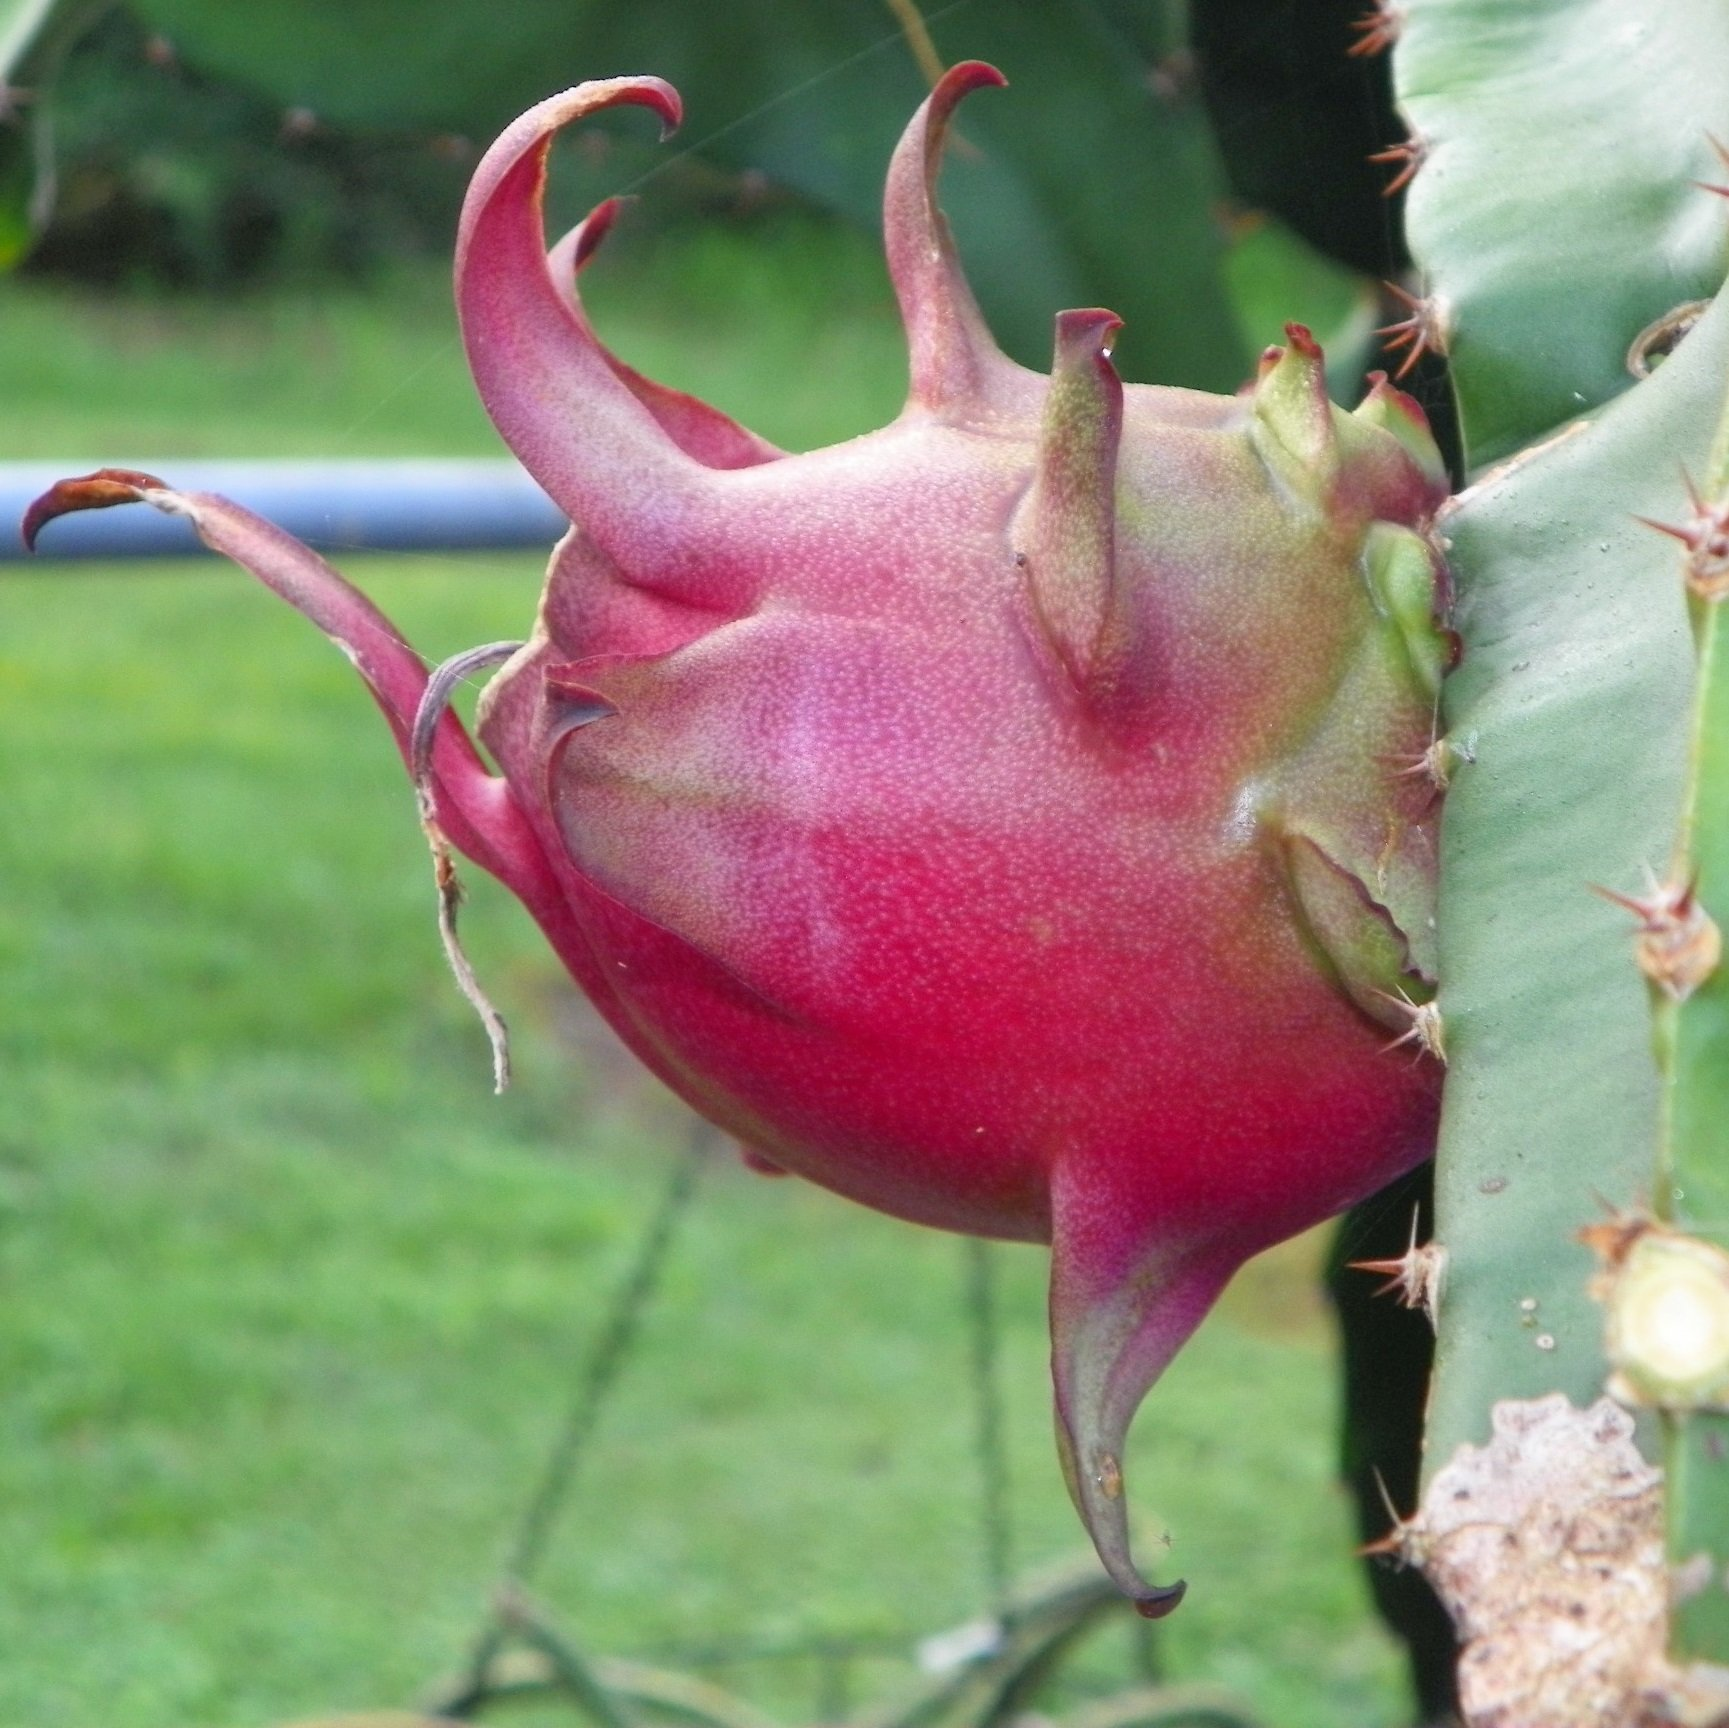 Armando Dragon Fruit variety fruit